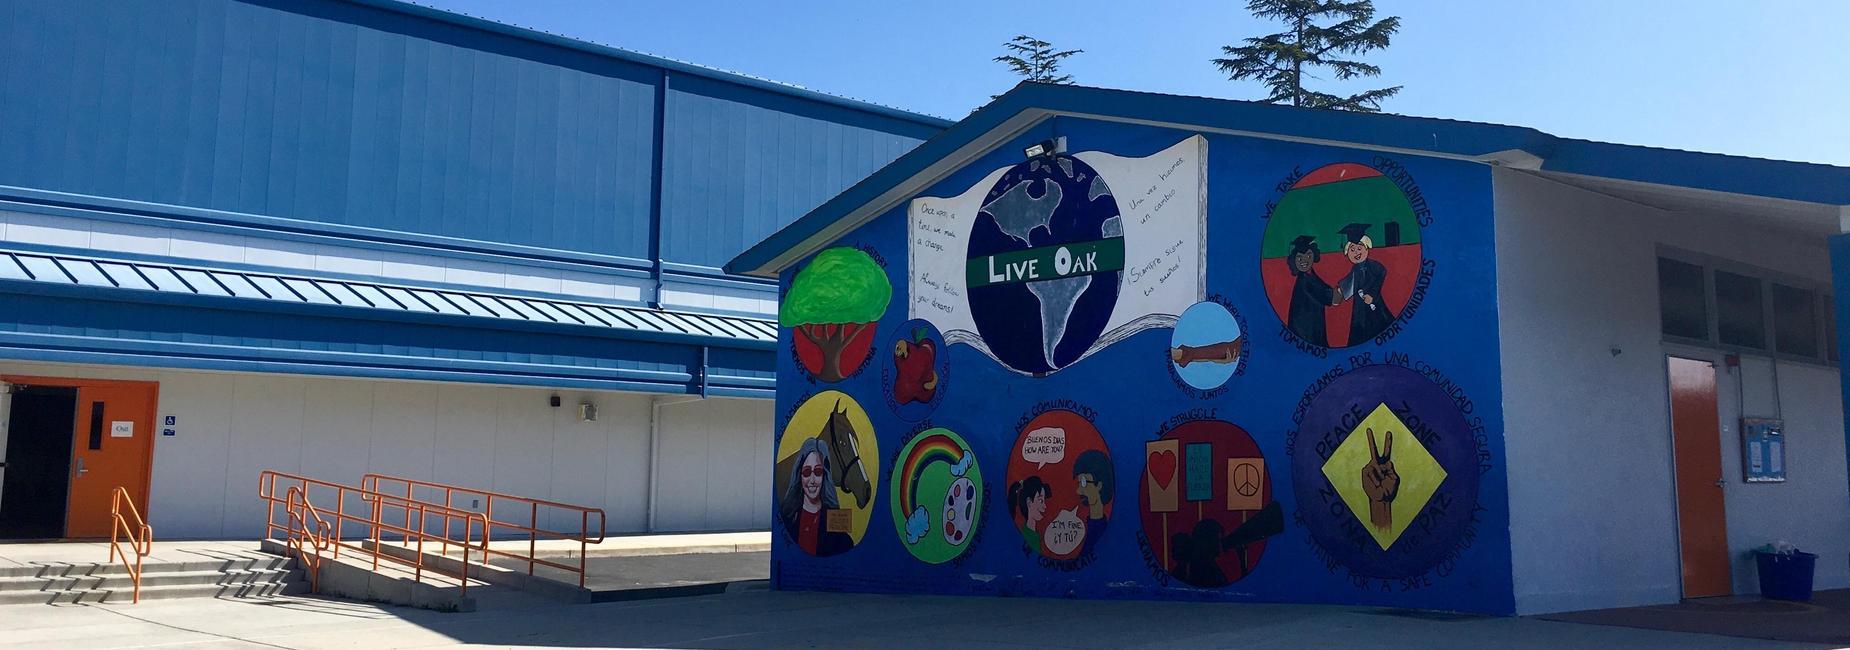 live oak elementary